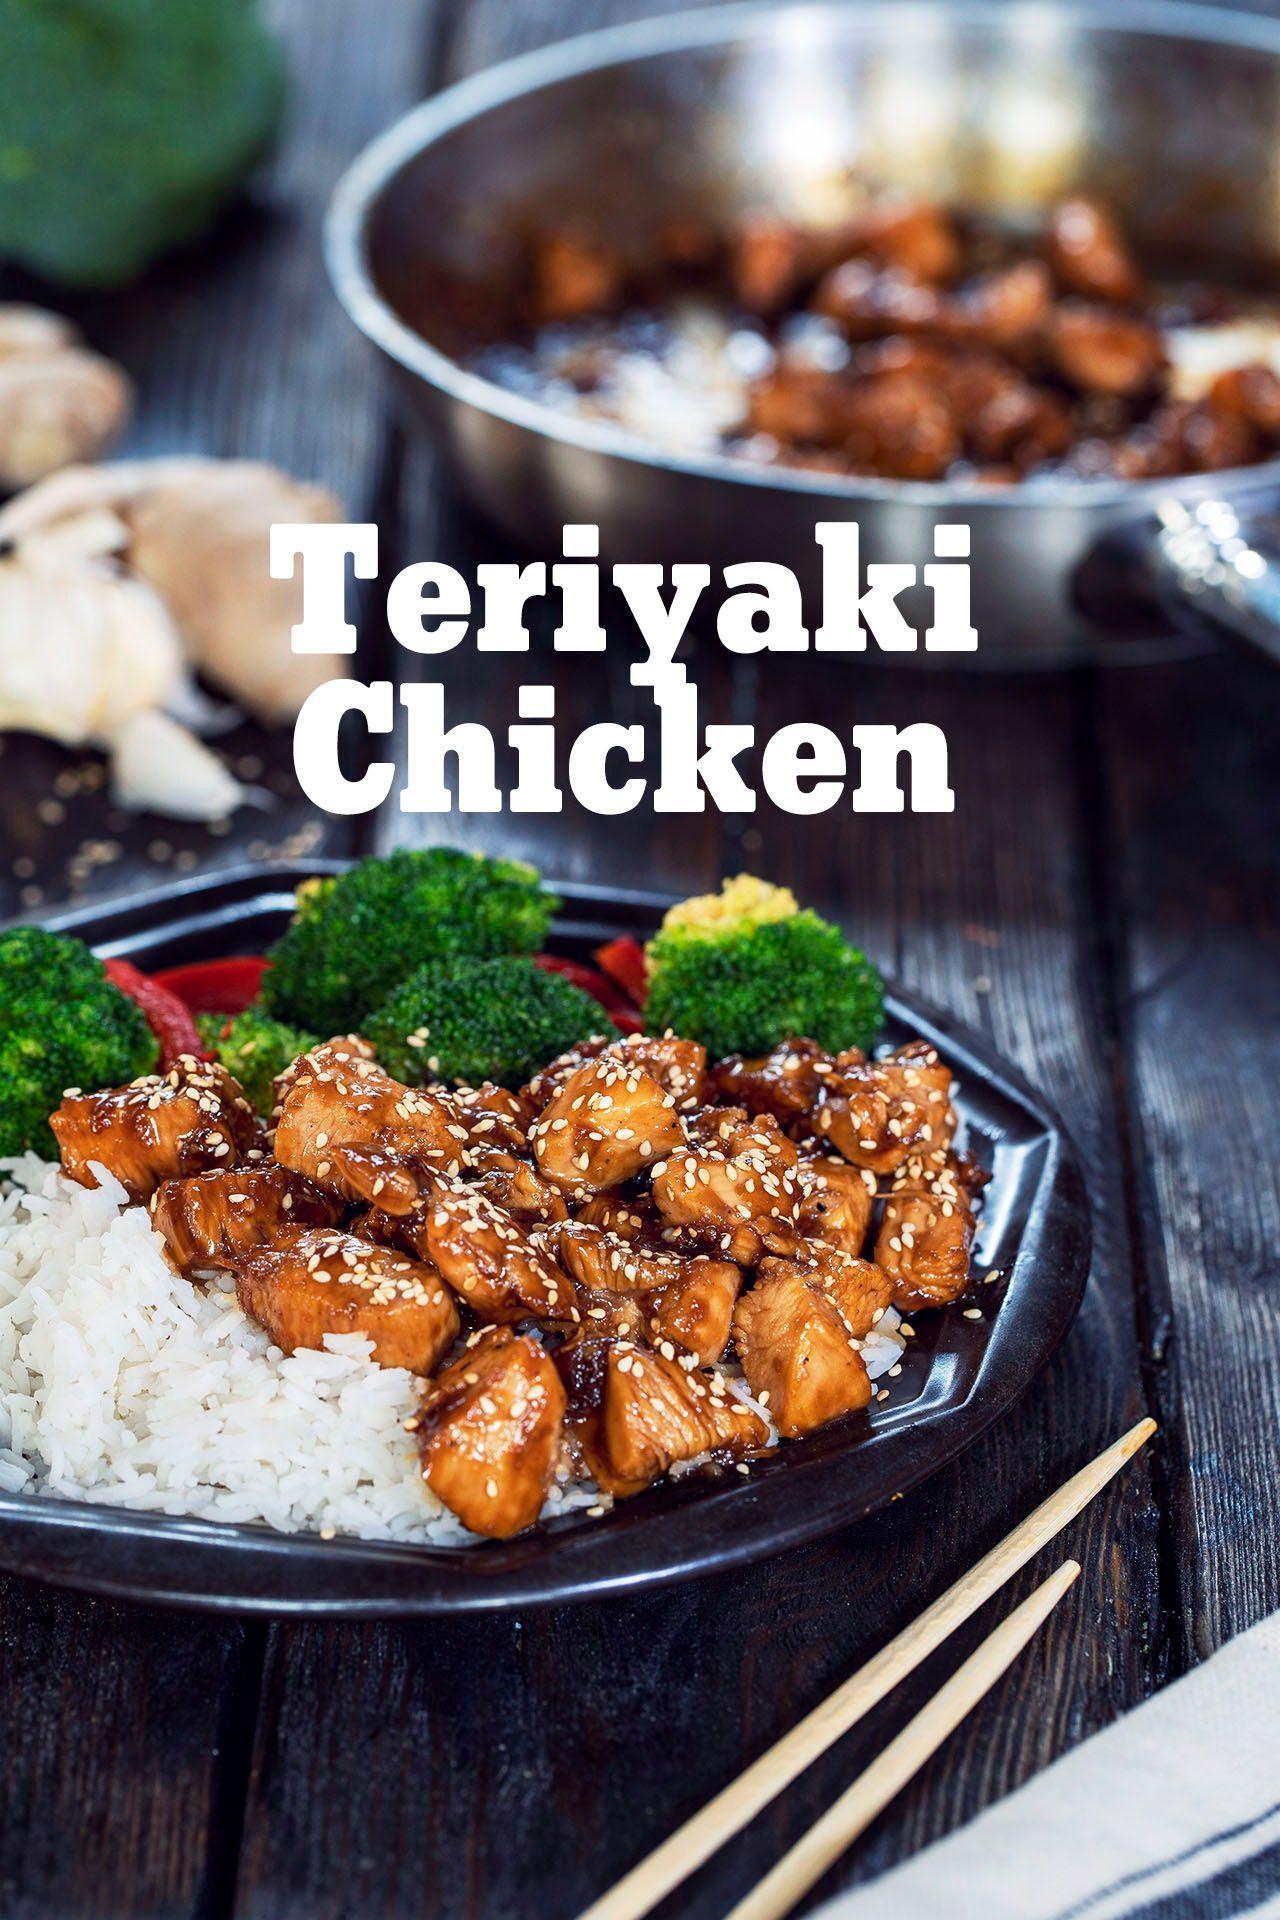 10 Minute Teriyaki Chicken Recipes212 Recipe In 2021 Chicken Teriyaki Recipe Recipes Teriyaki Chicken